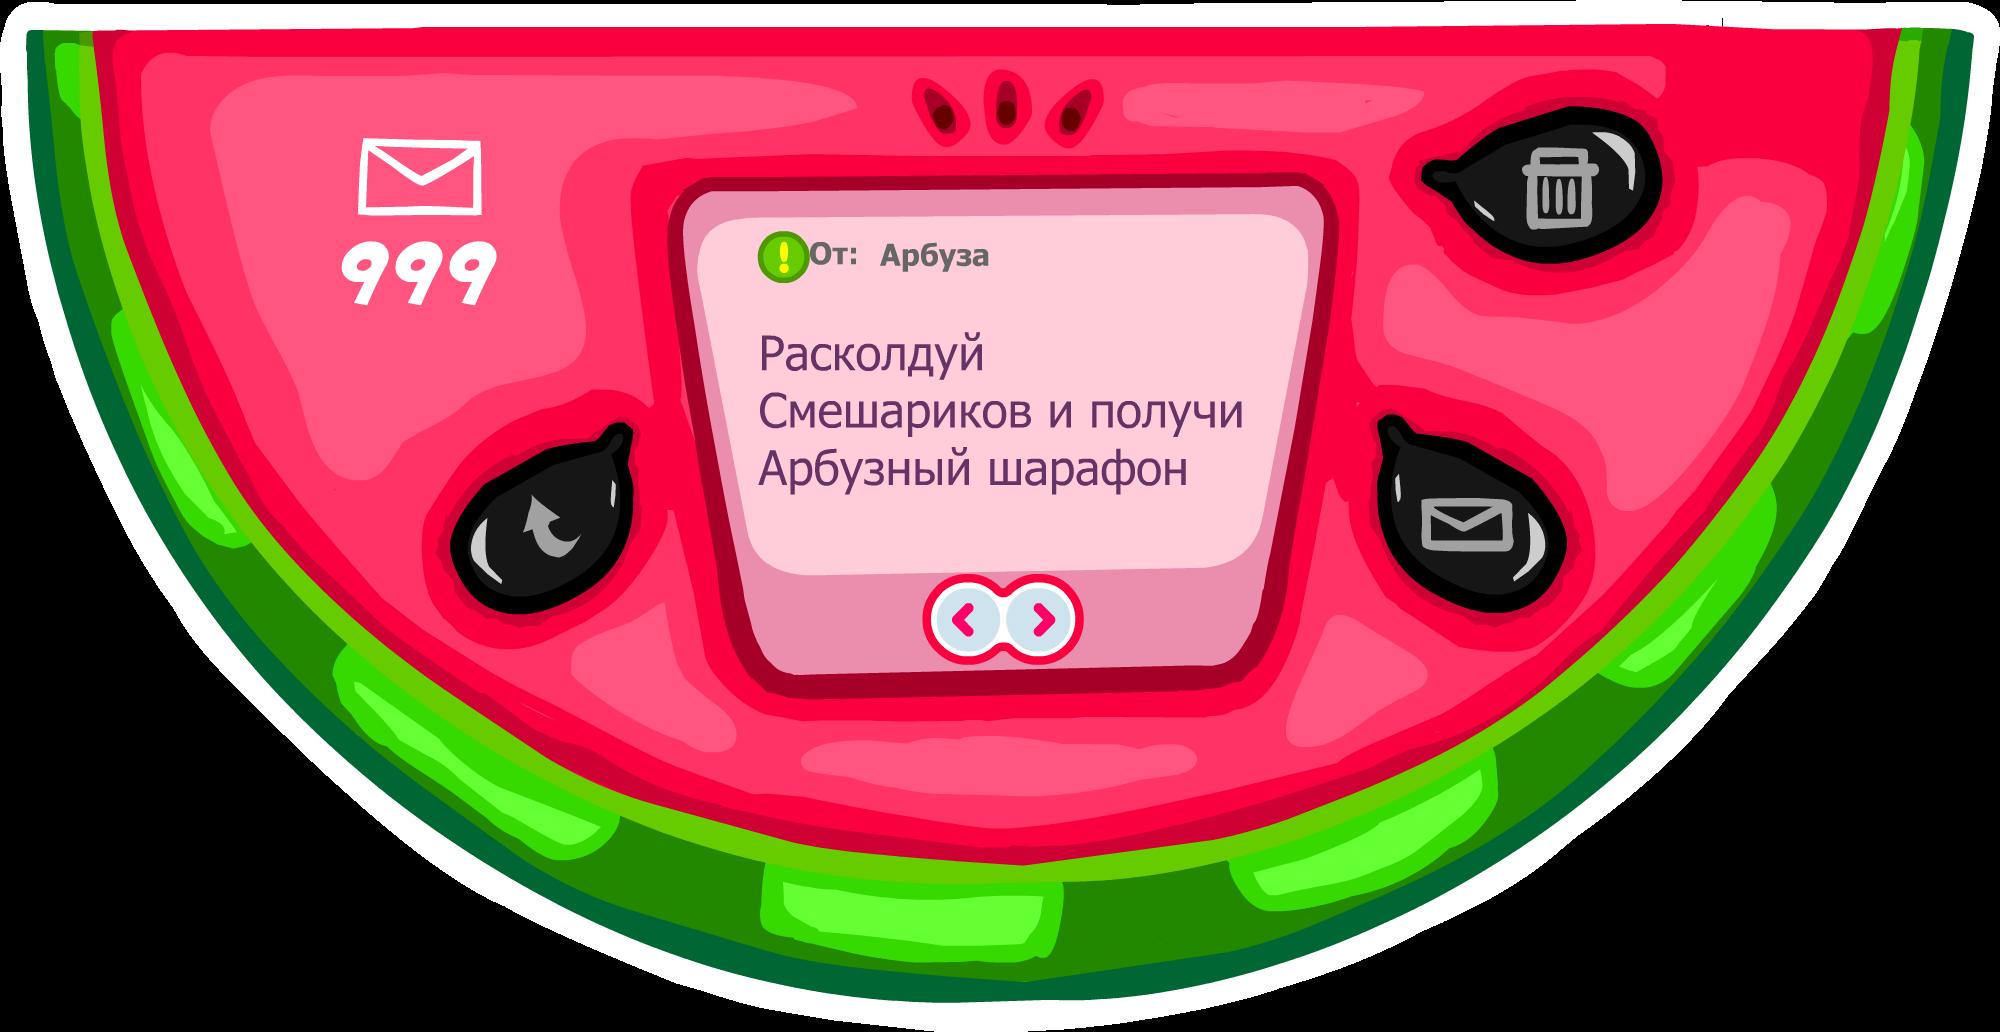 Арбузный шарафон